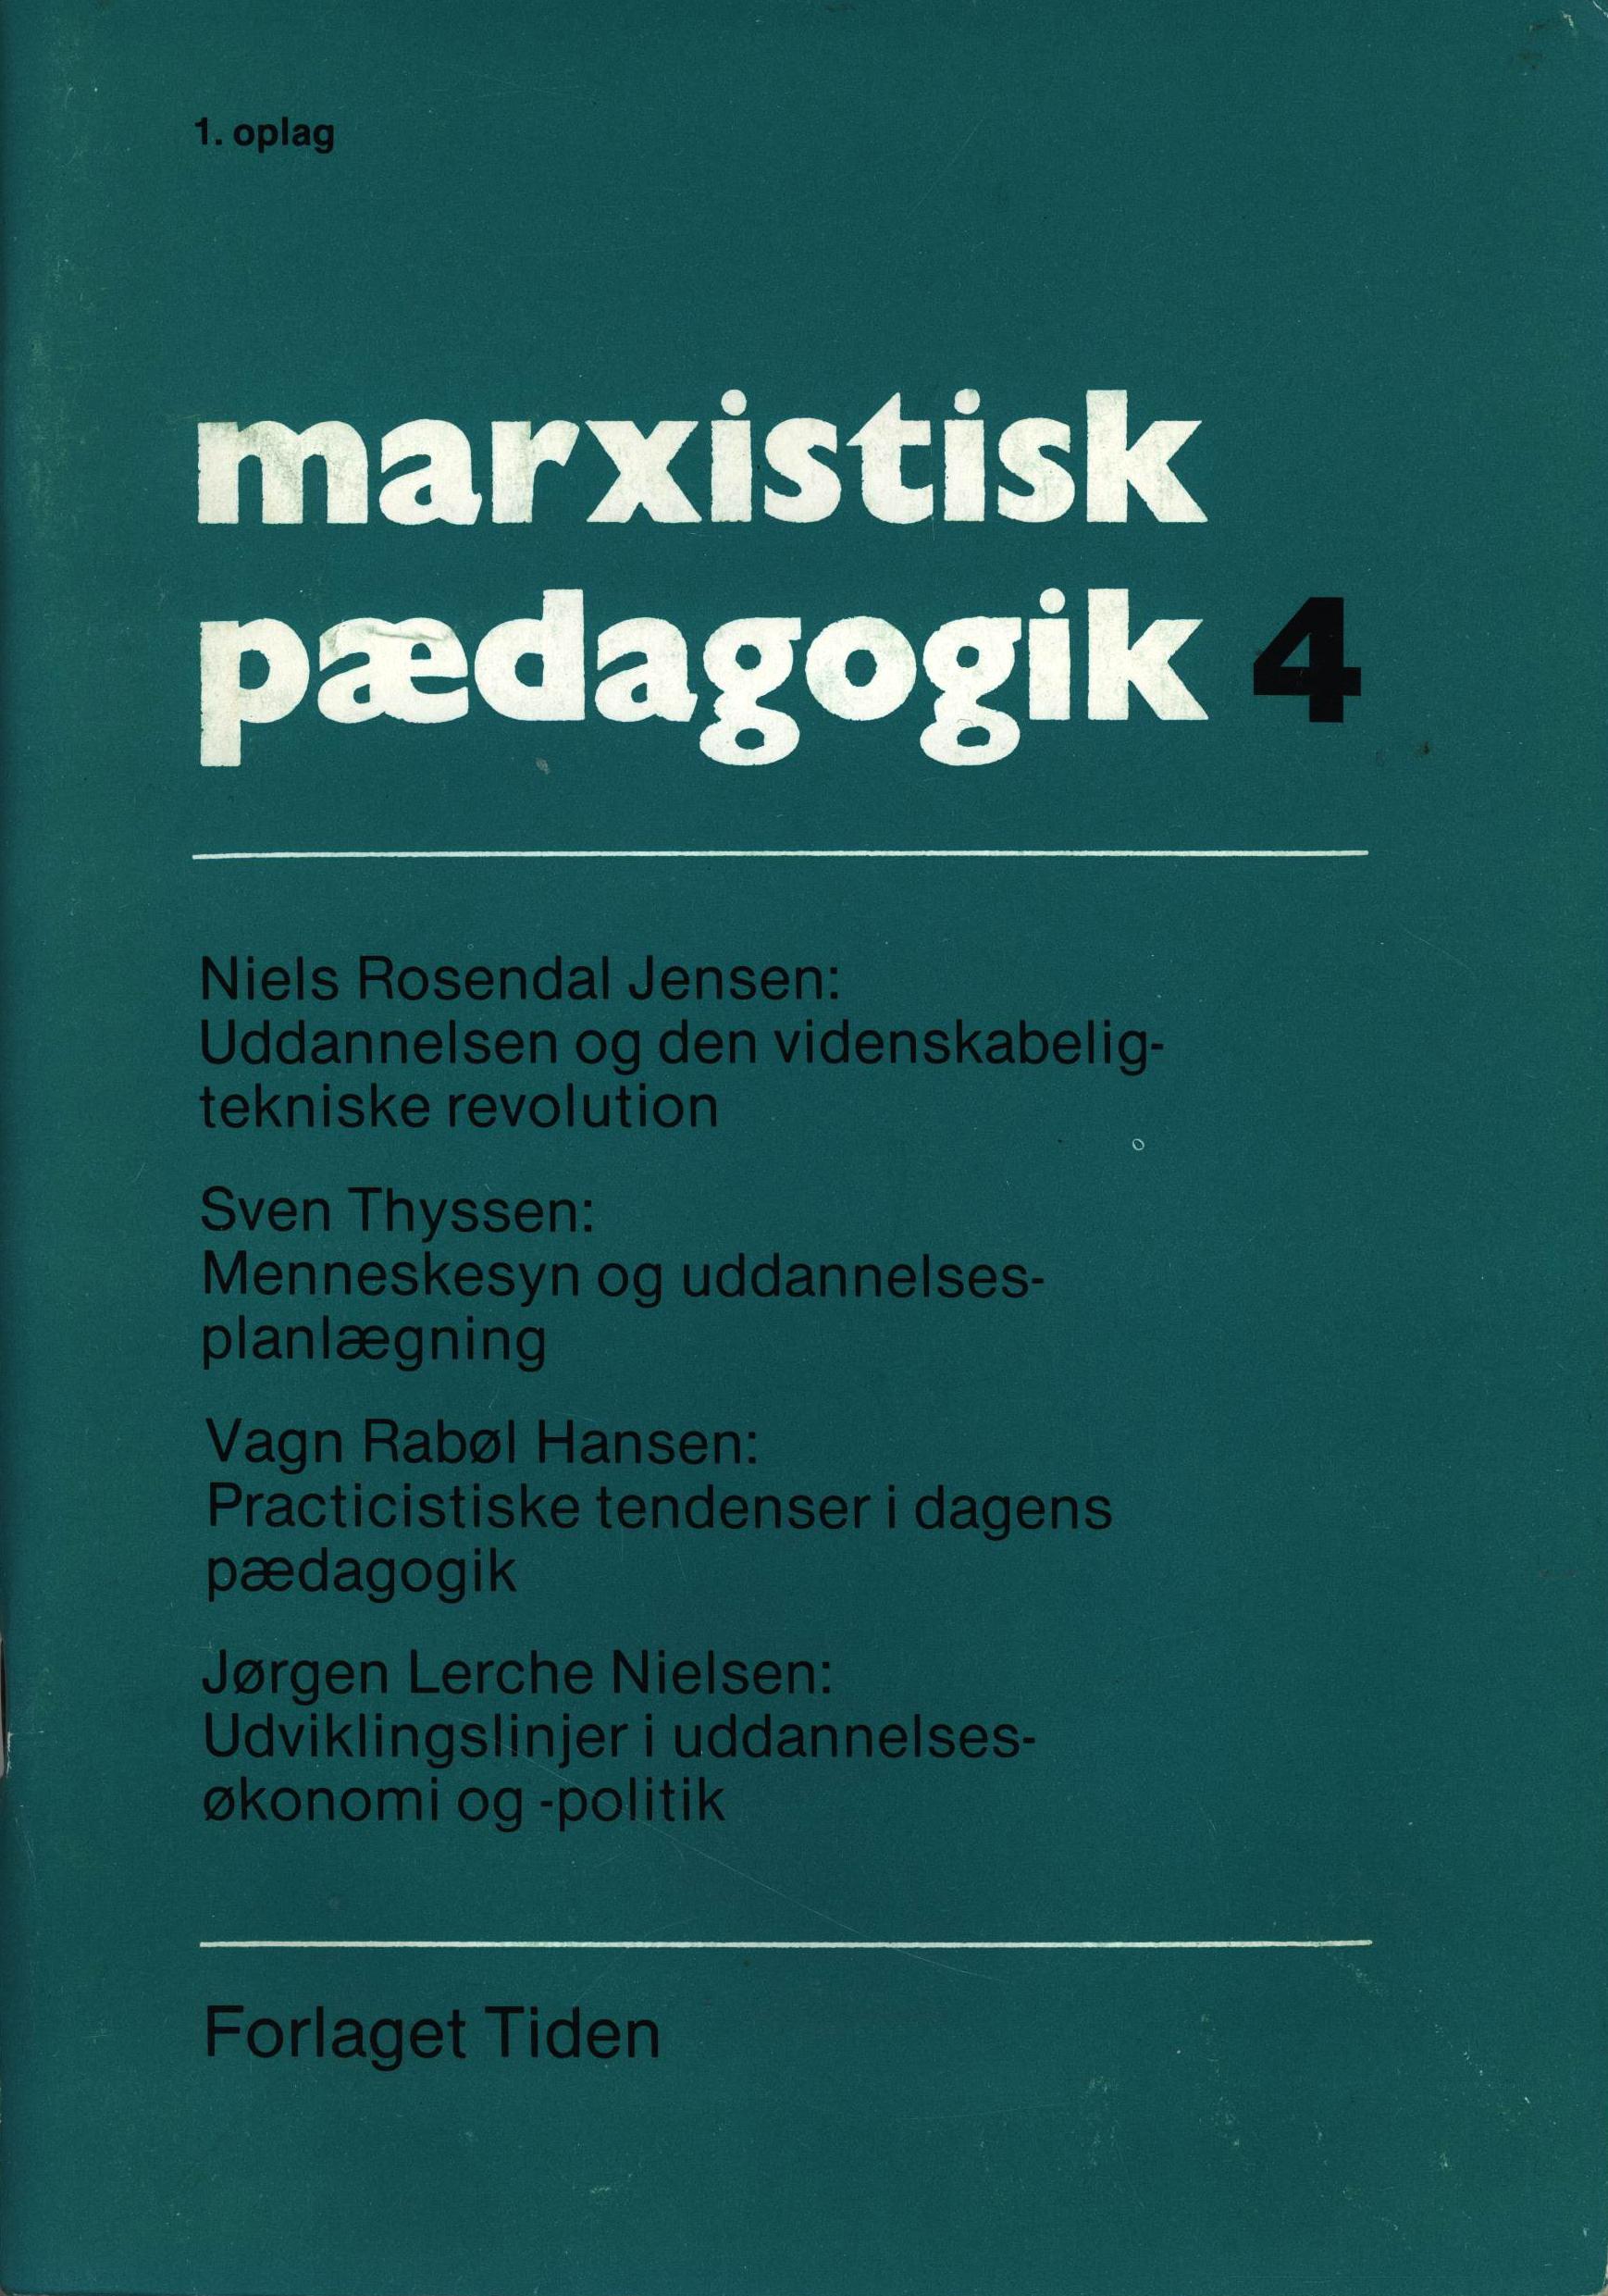 Marxistisk pædagogik #4